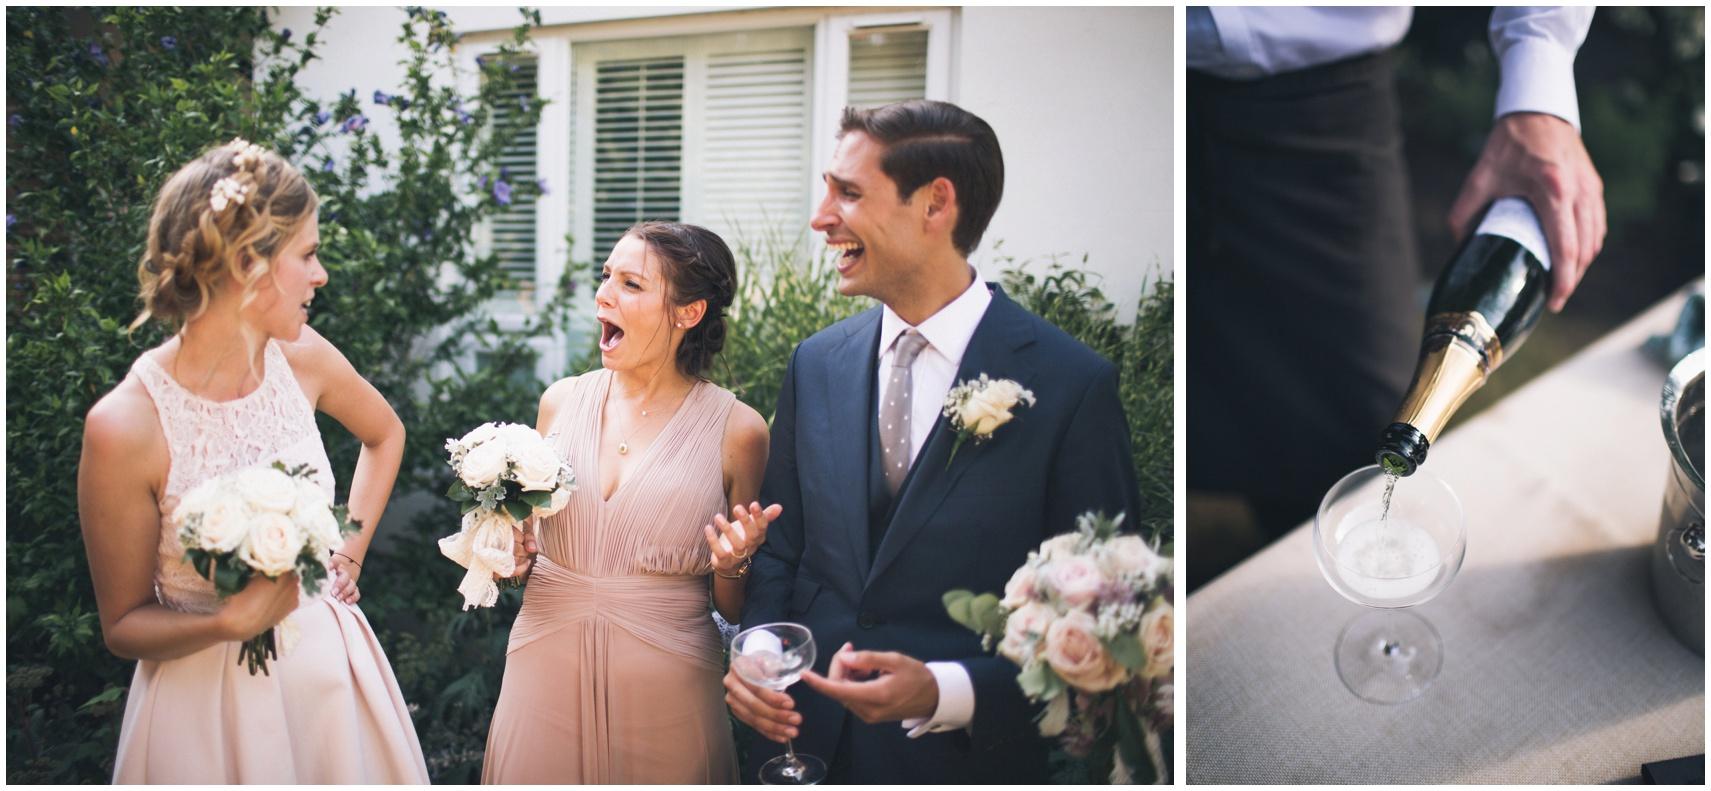 BMC Wedding photography Rutland_0314.jpg